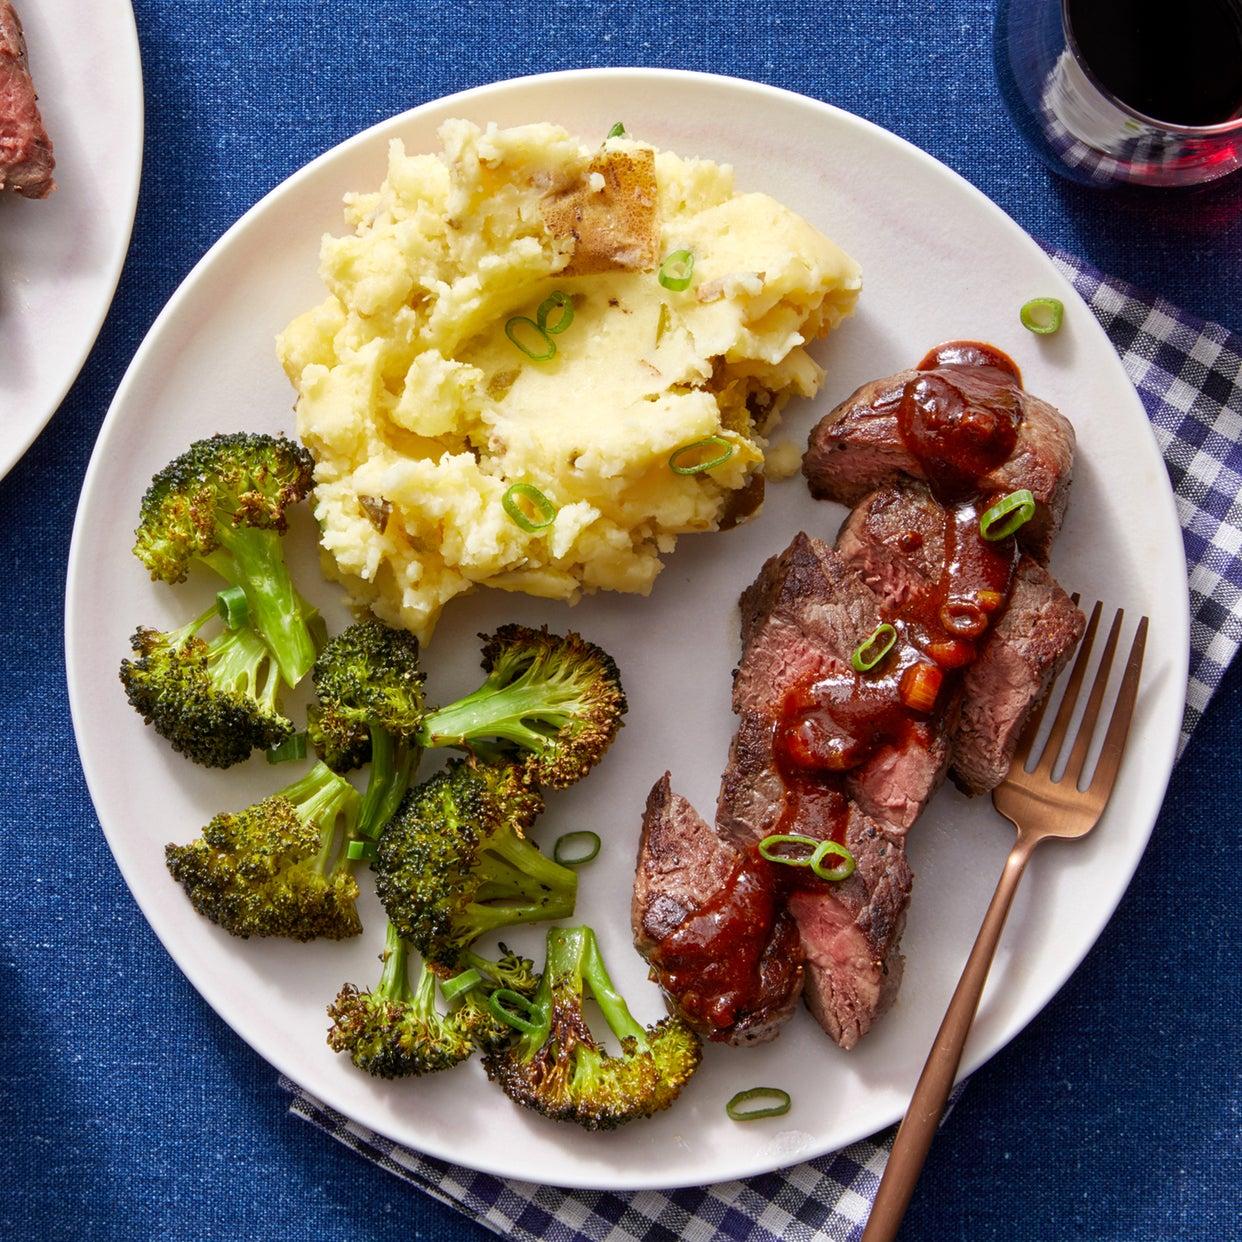 Seared Steaks & Loaded Mashed Potatoes with Roasted Broccoli & Guajillo-Honey Sauce